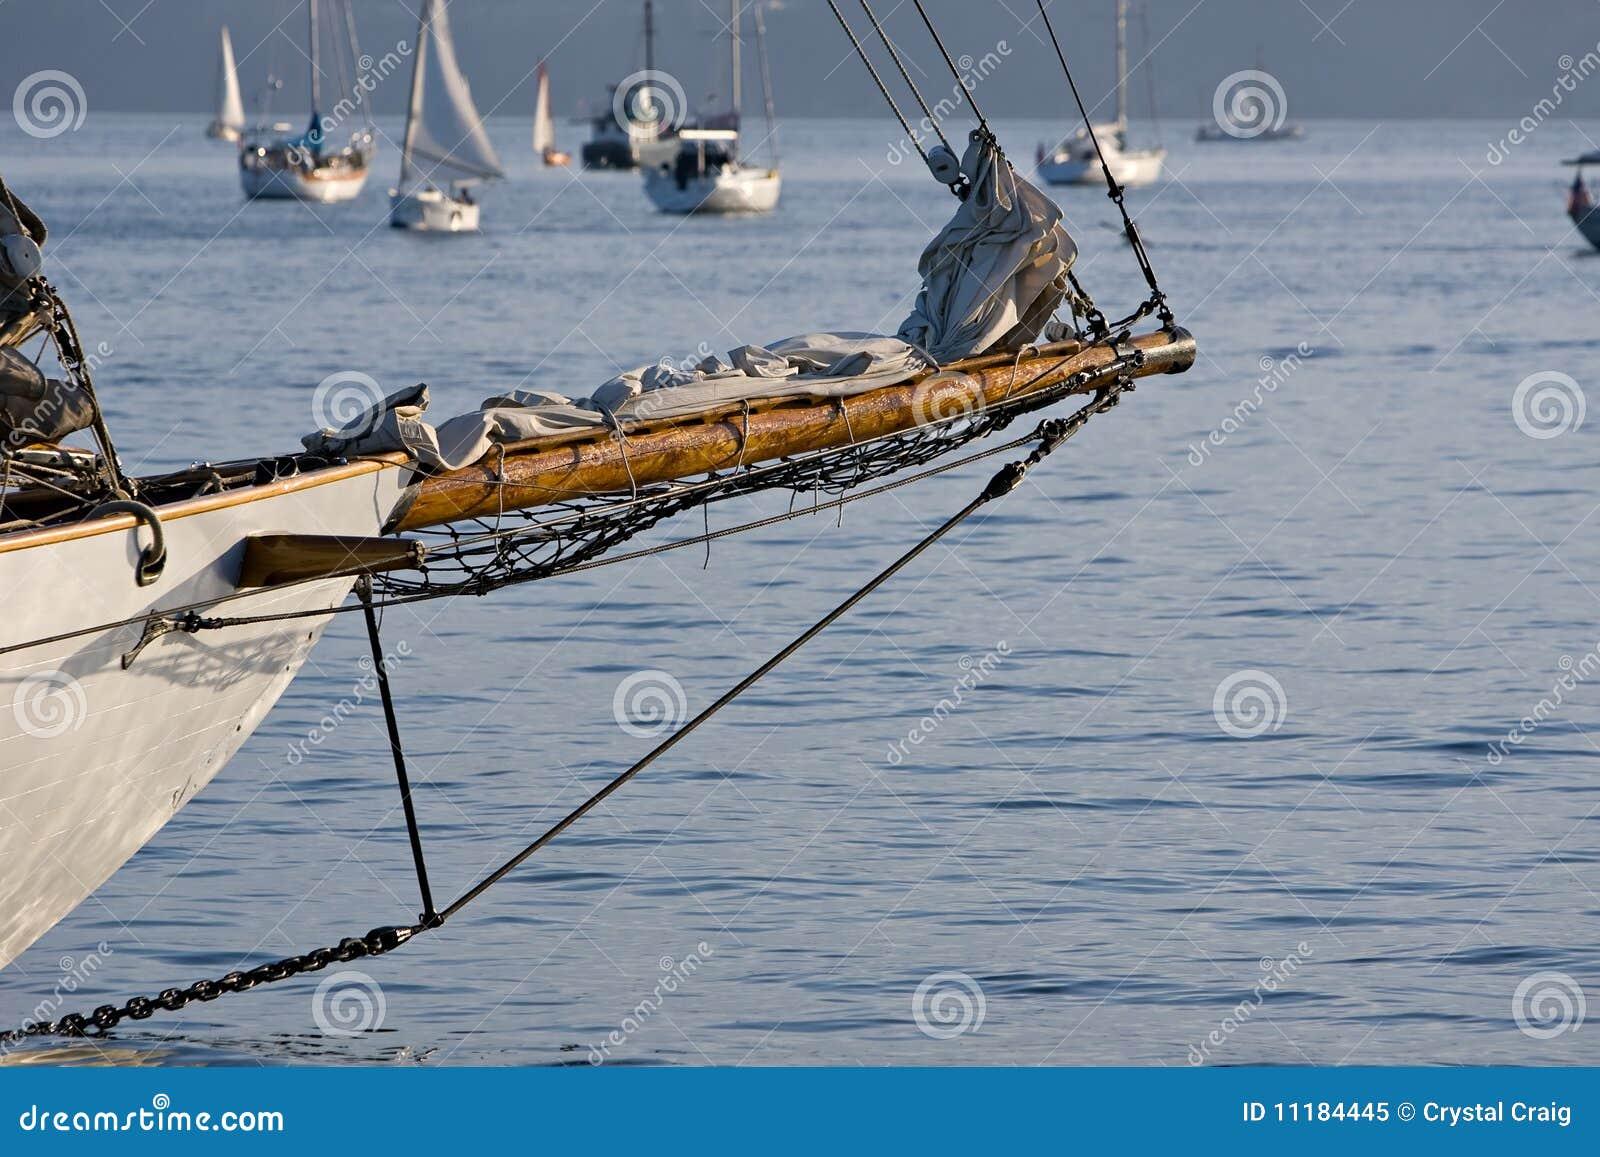 Classic Craftsmanship Sailboat Bowsprit Stock Image - Image: 11184445